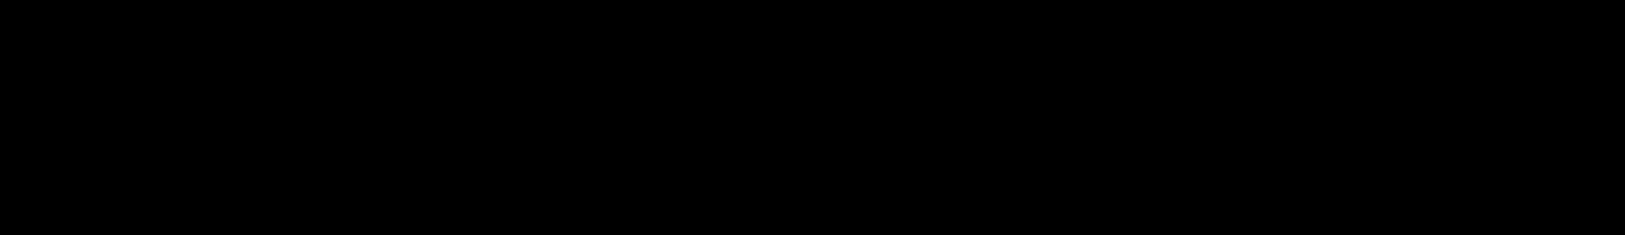 Doradani SemiBold